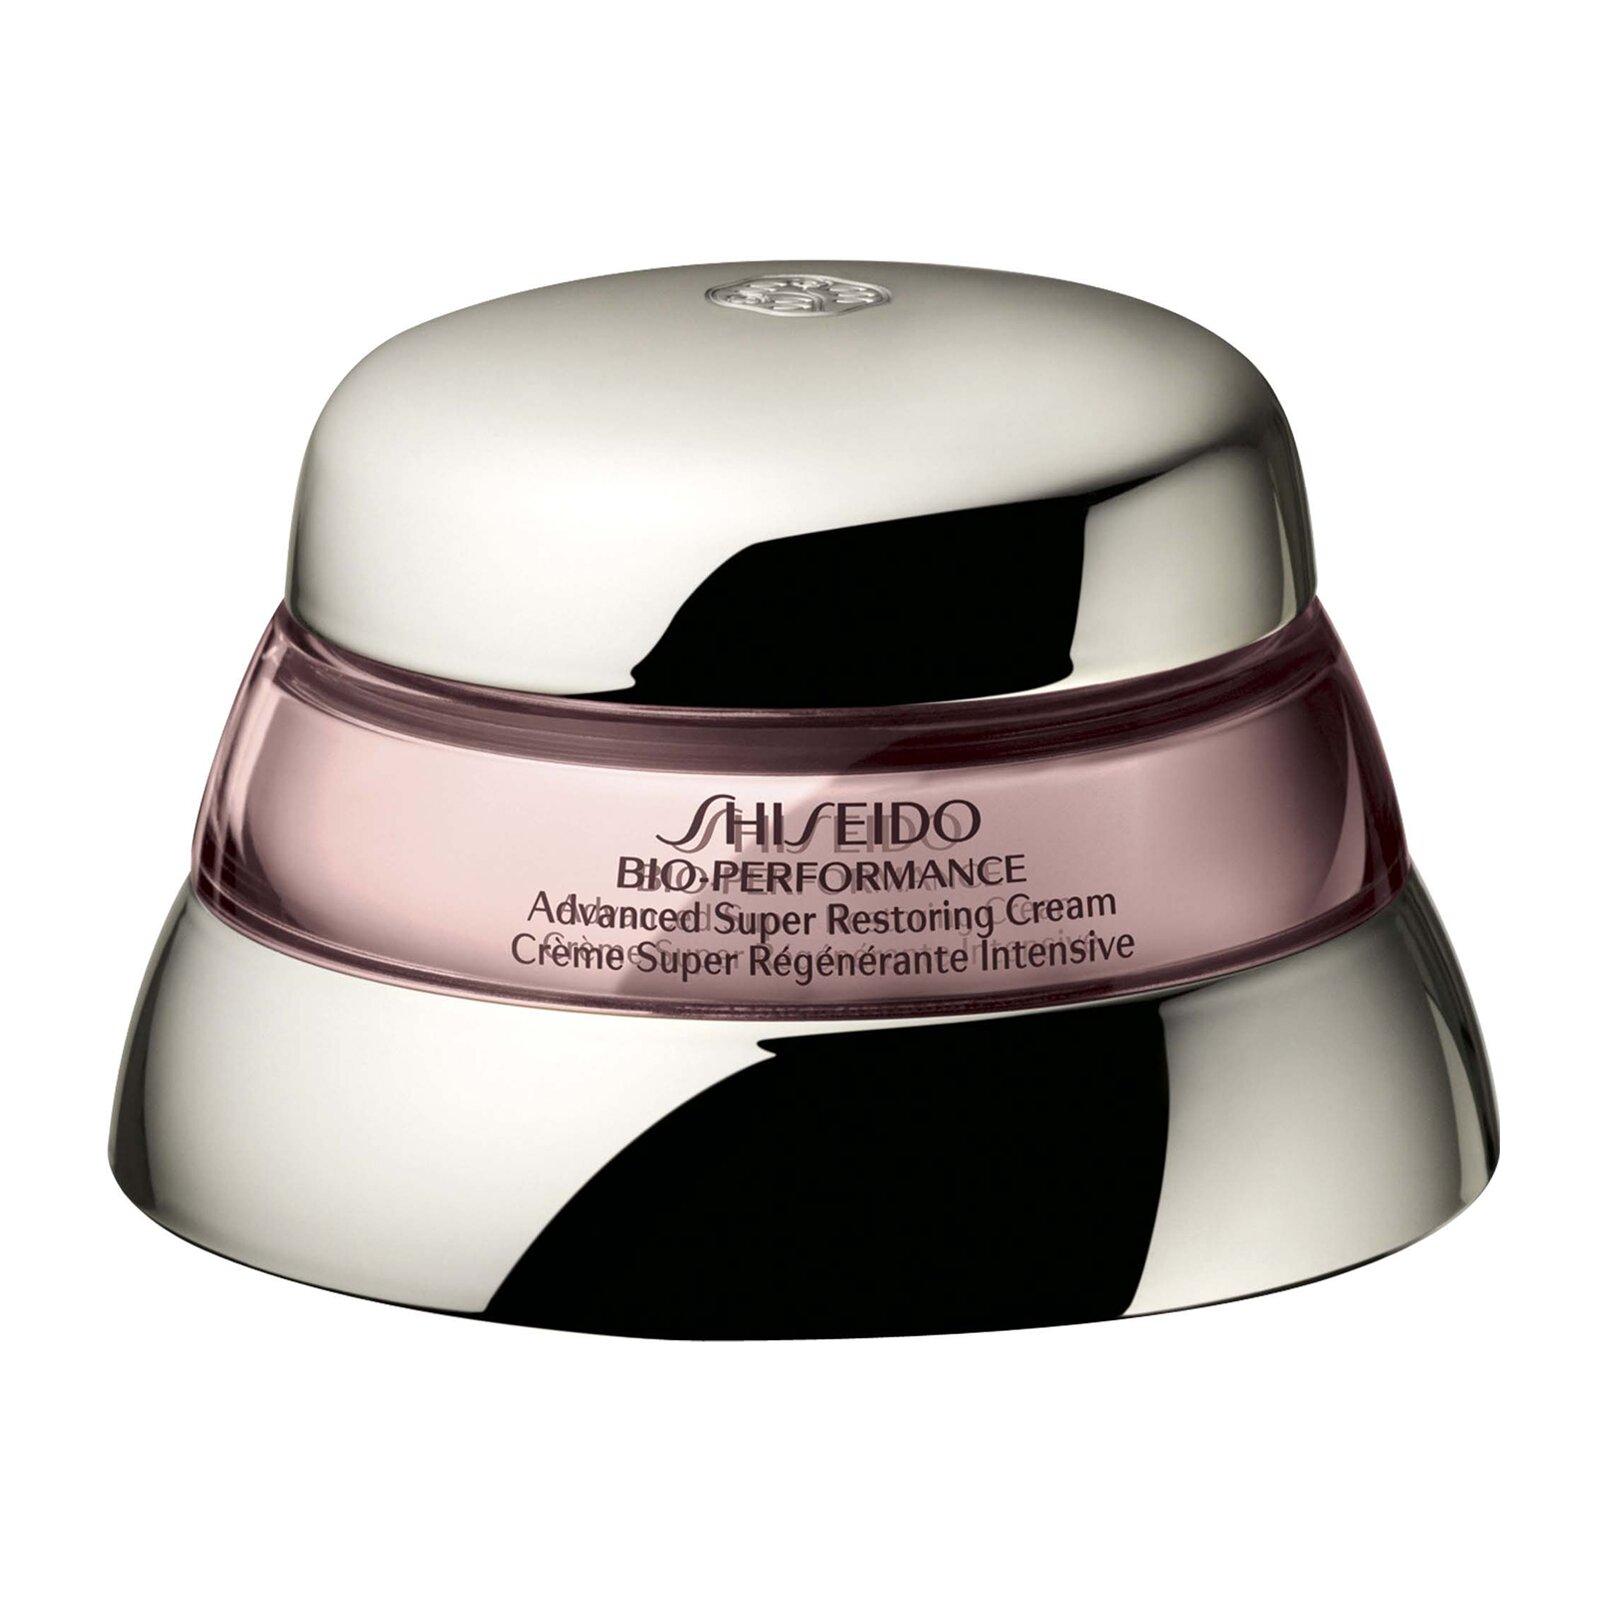 Kem chống lão hóa Shiseido Bio-Performance Advanced Super Restoring Cream 50ml